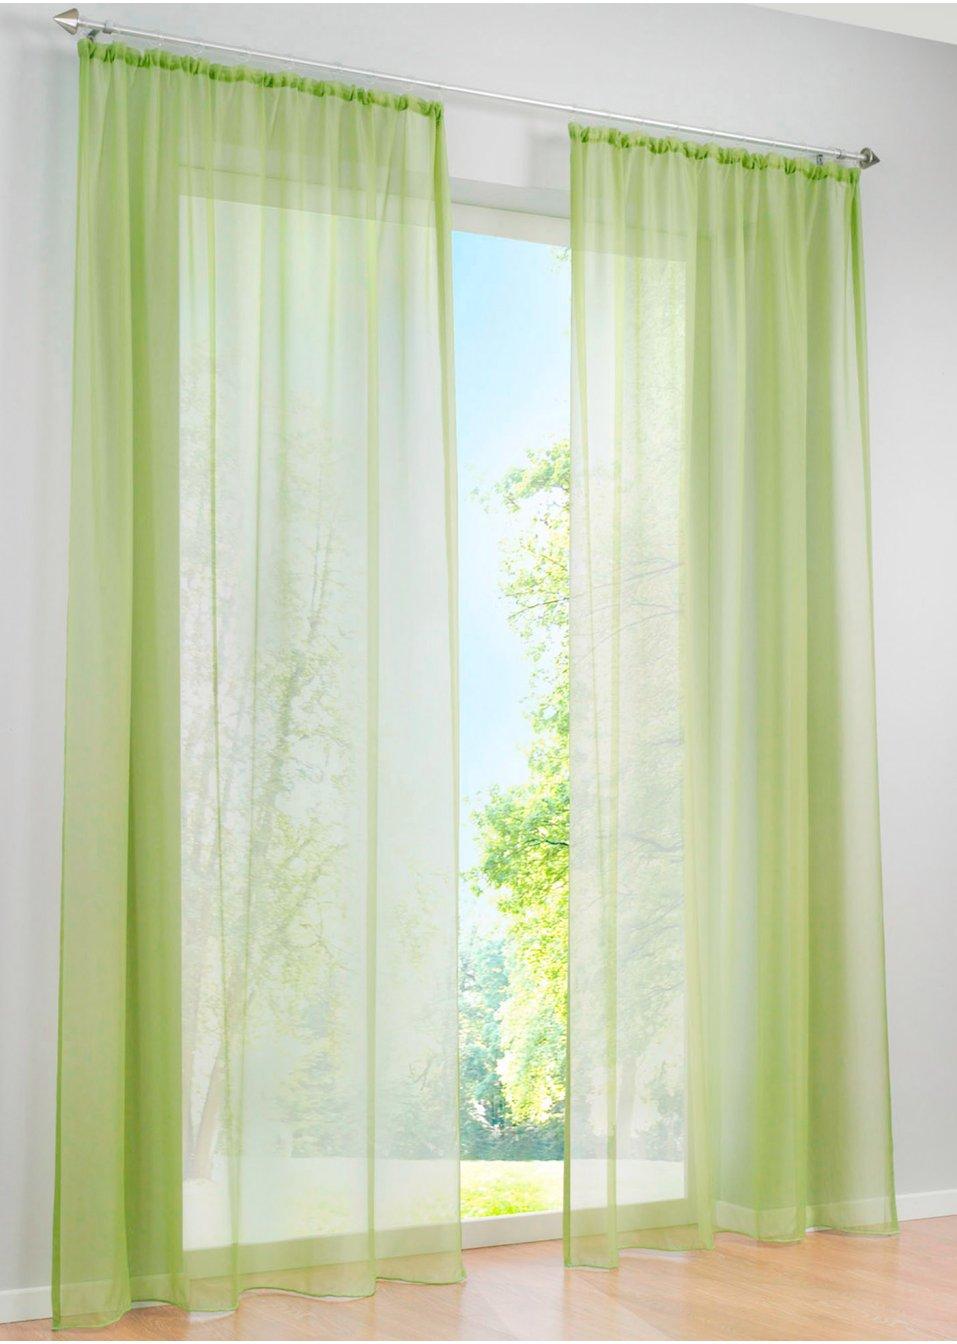 voilage uni 1 pce vert maison bpc living. Black Bedroom Furniture Sets. Home Design Ideas